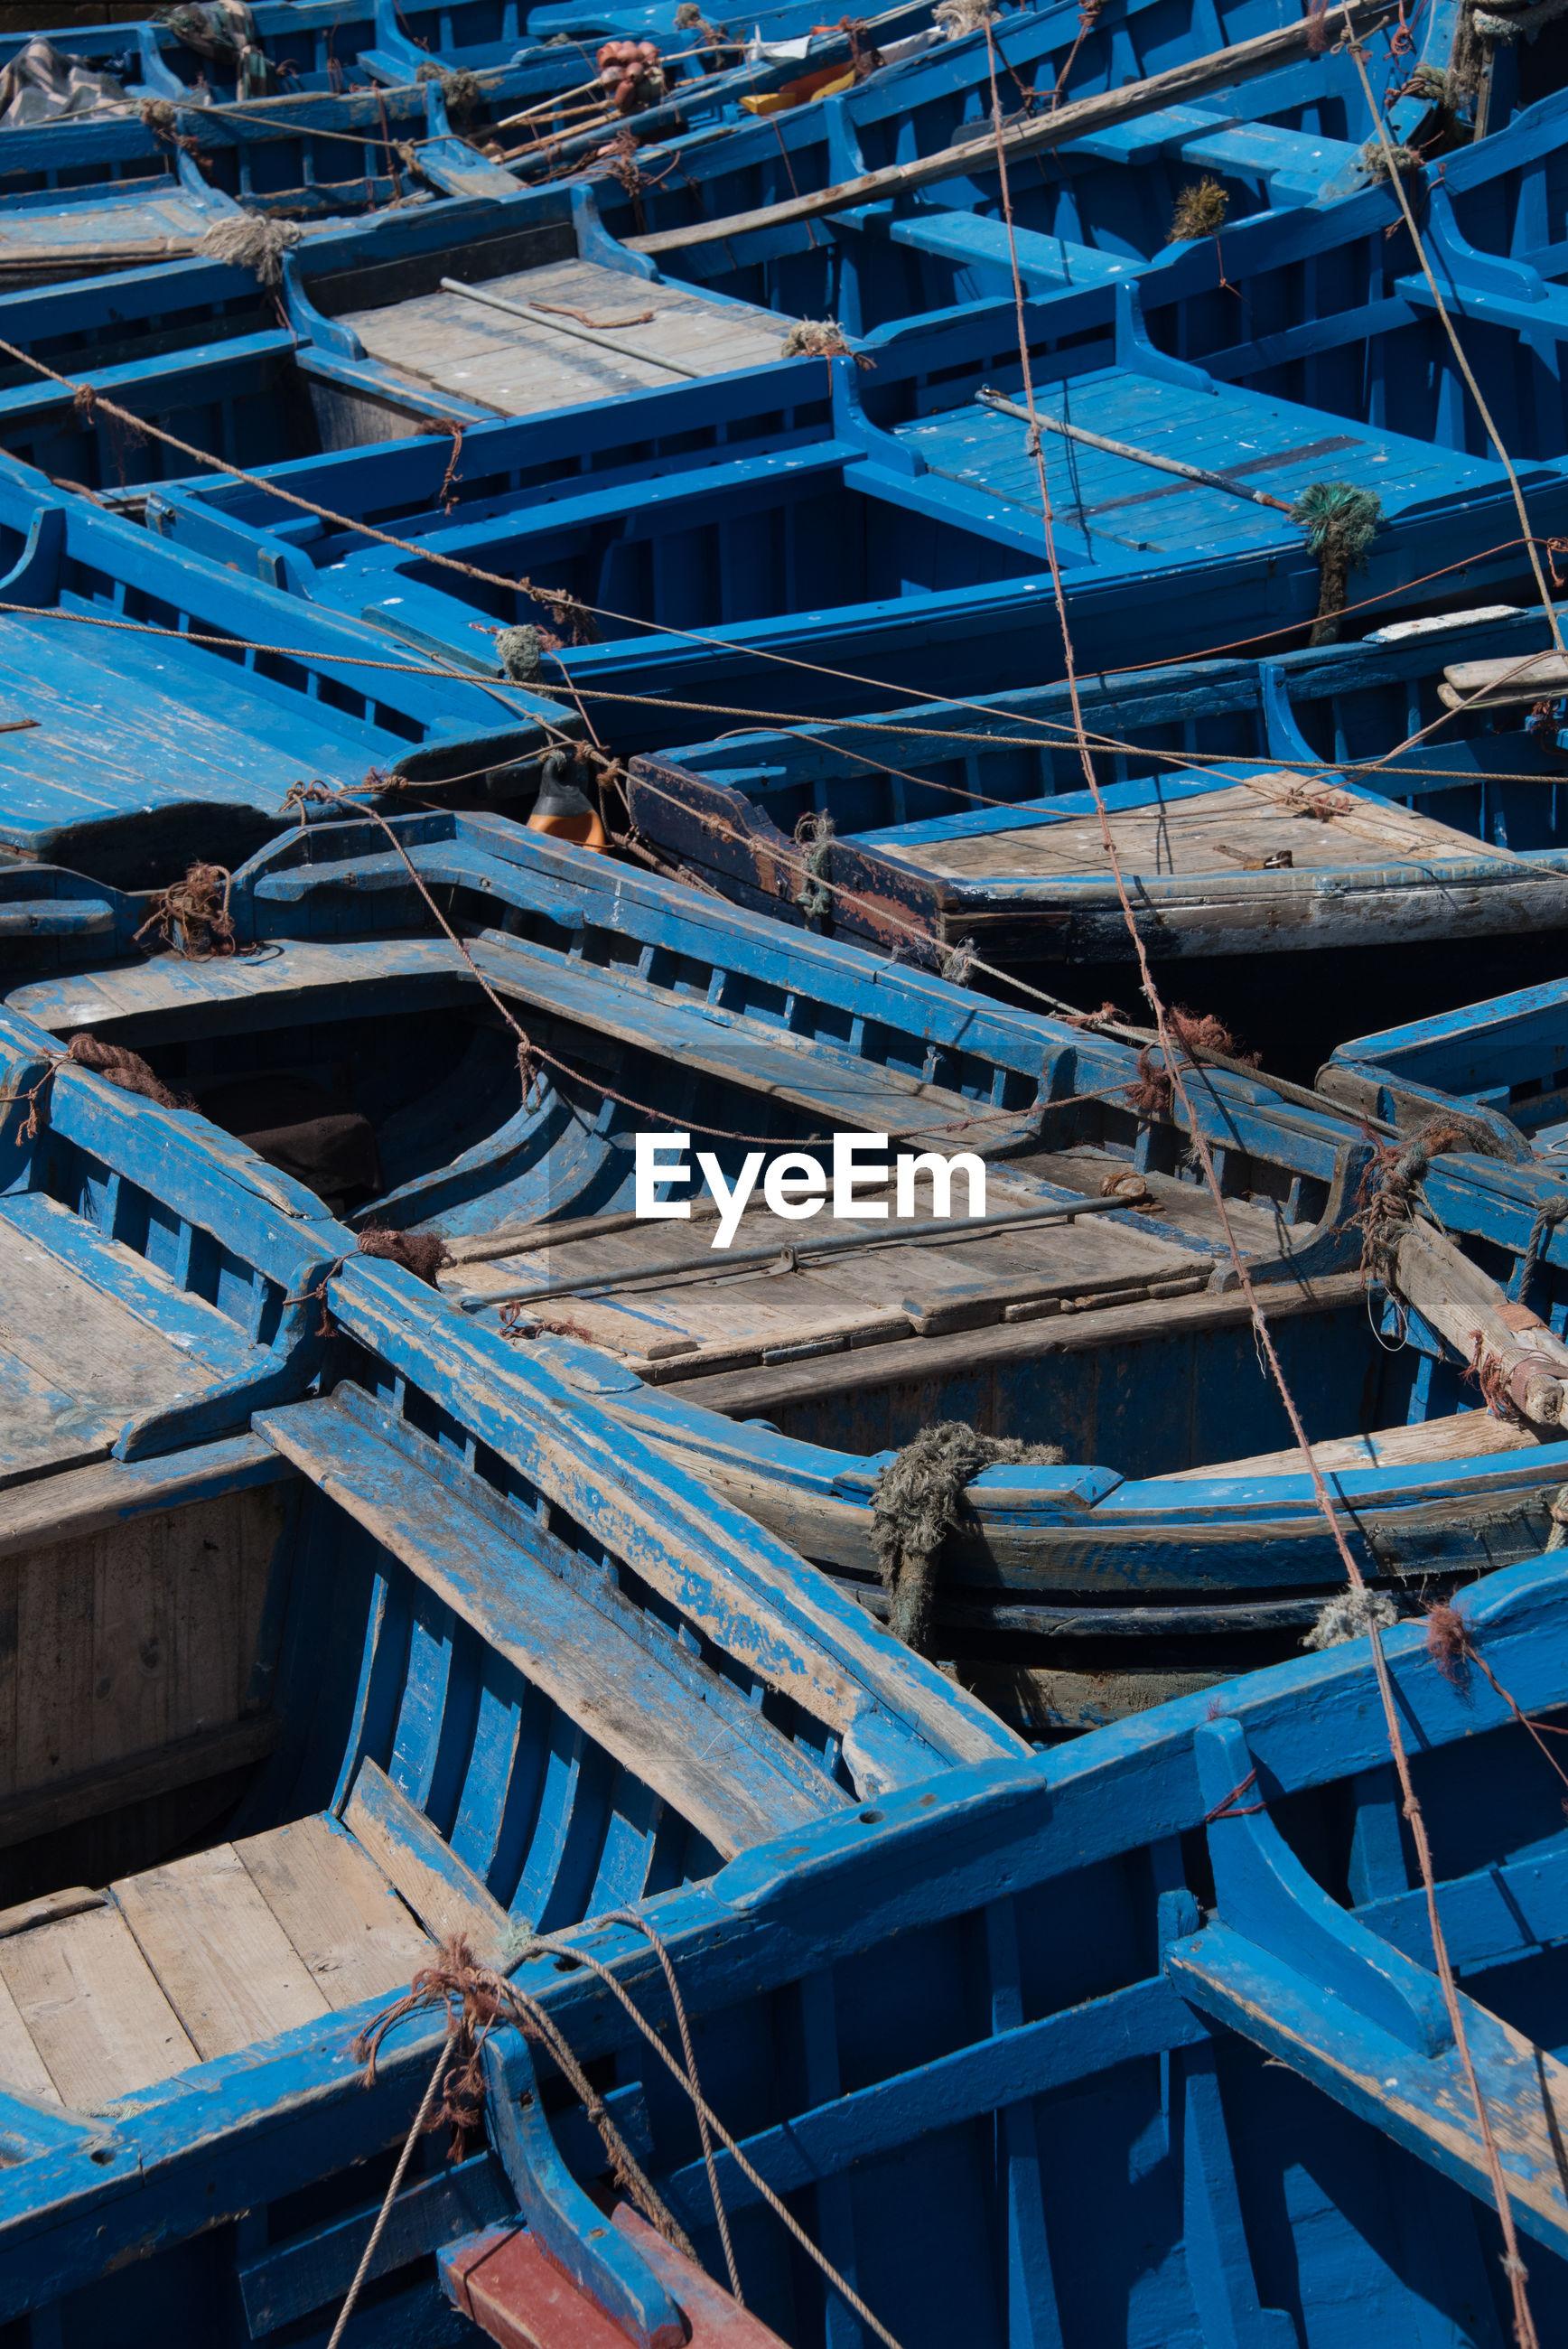 Full frame shot of fishing boats moored at harbor